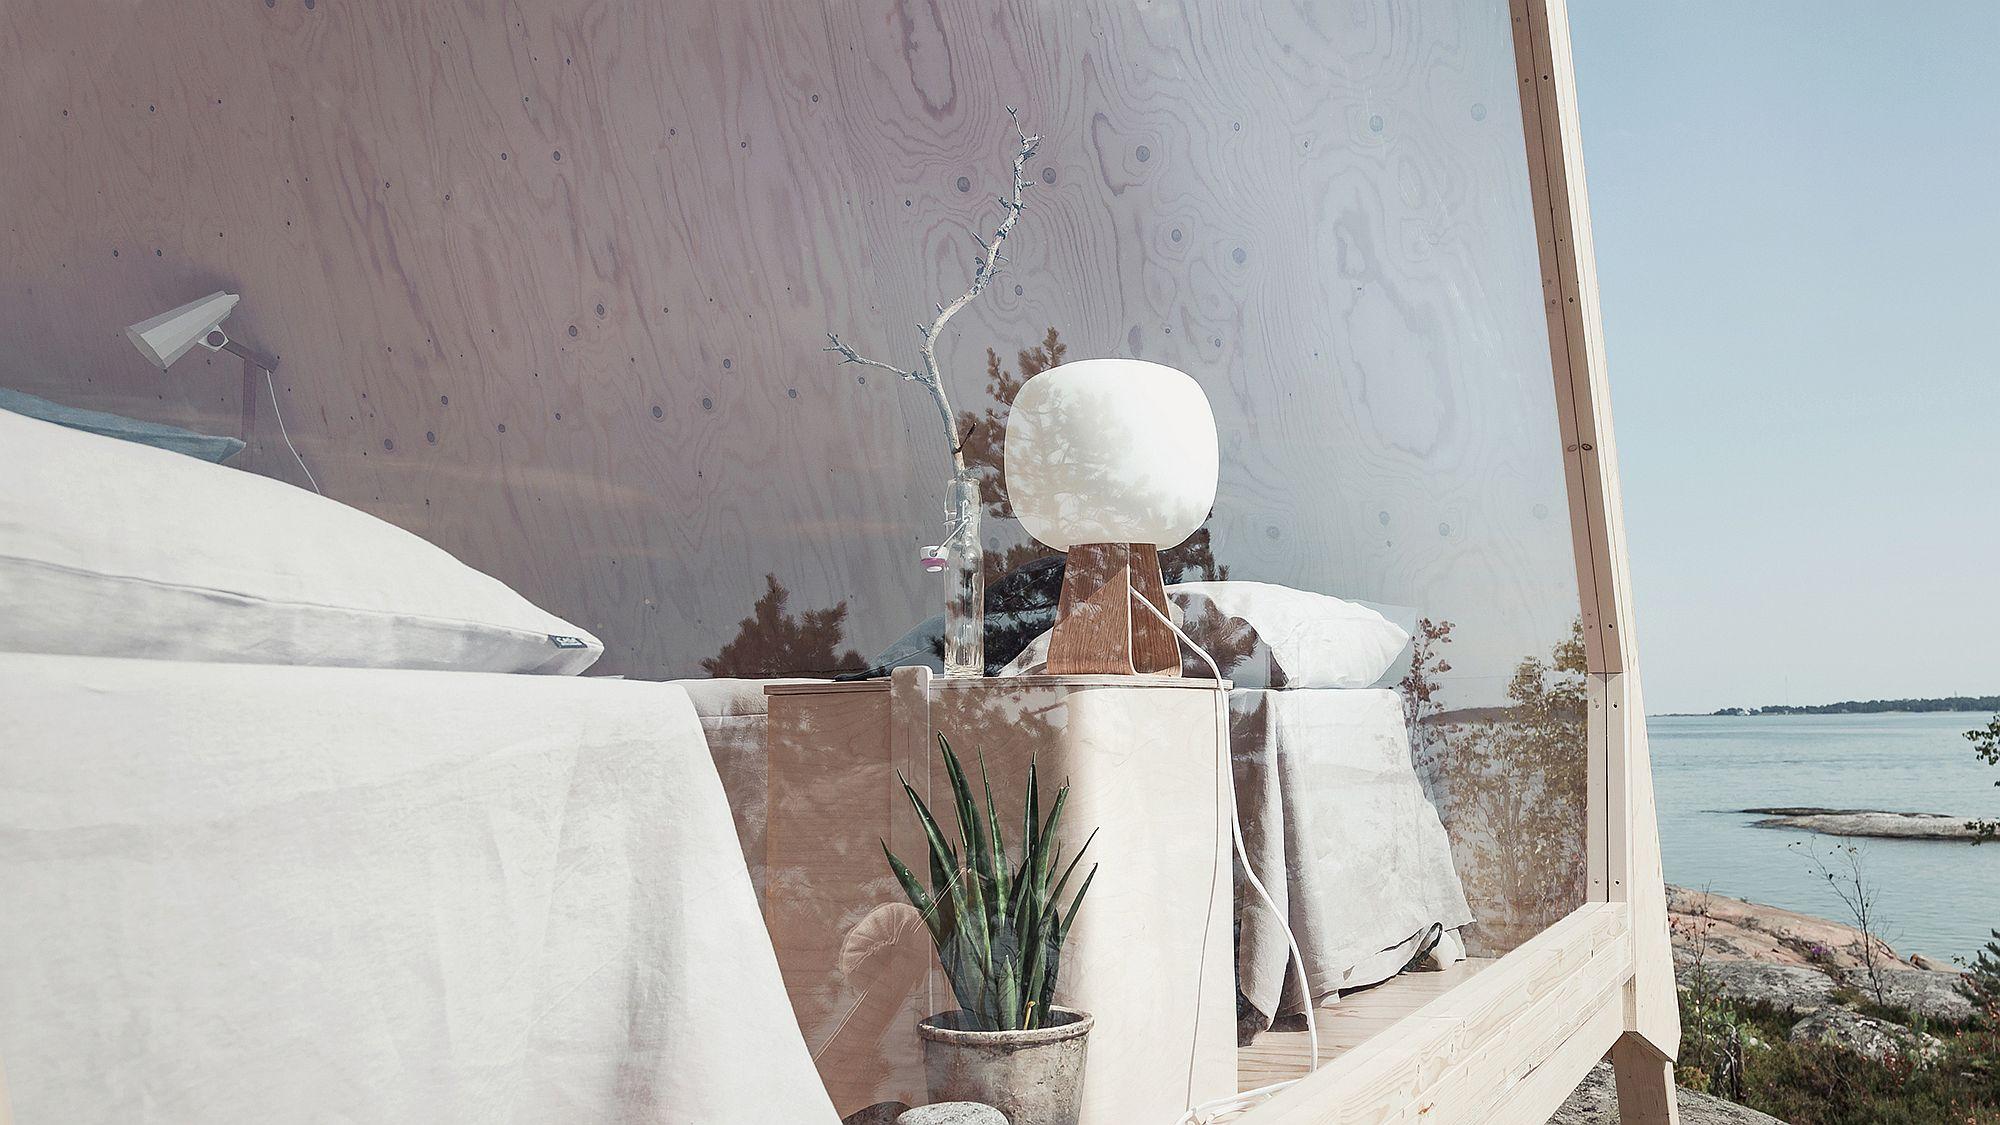 Contemporary decor and Scandinavian simplicity take over inside the cabin